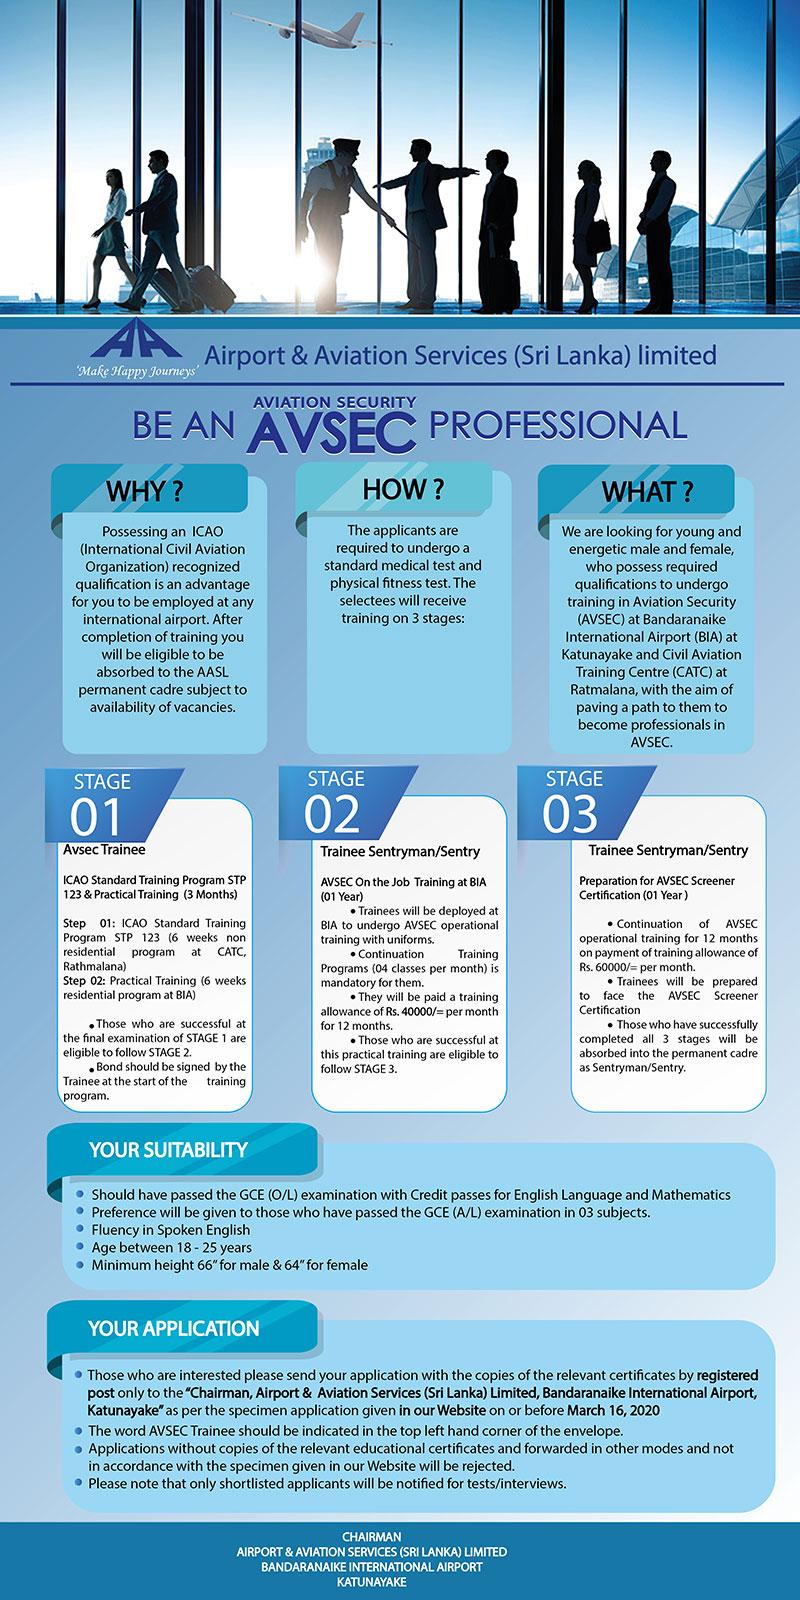 Avsec Trainee - Airport & Aviation Services (Sri Lanka) Ltd